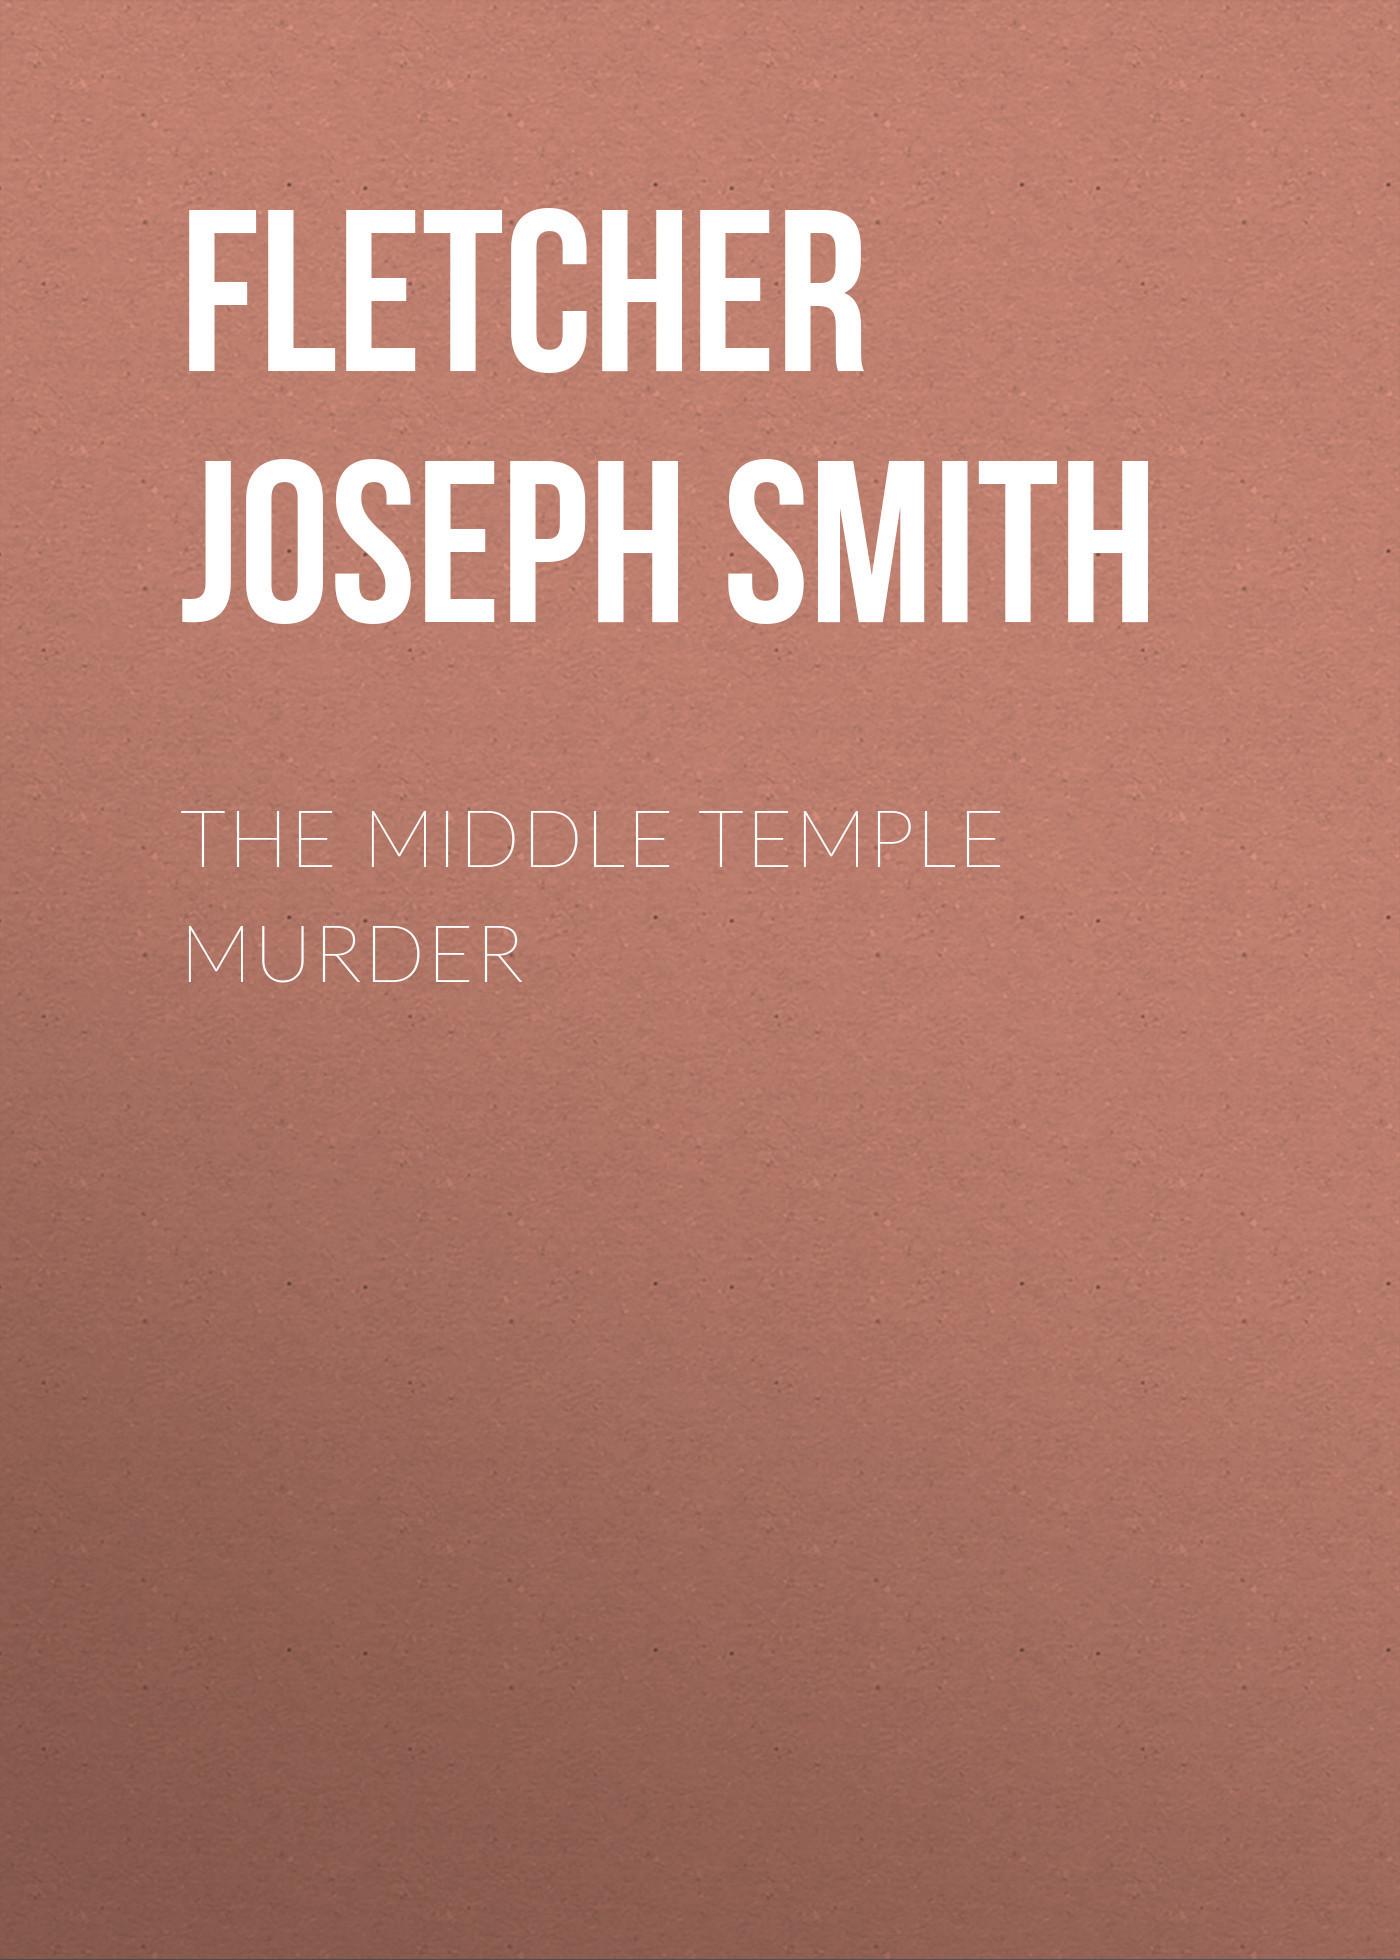 Fletcher Joseph Smith The Middle Temple Murder wedding cake murder